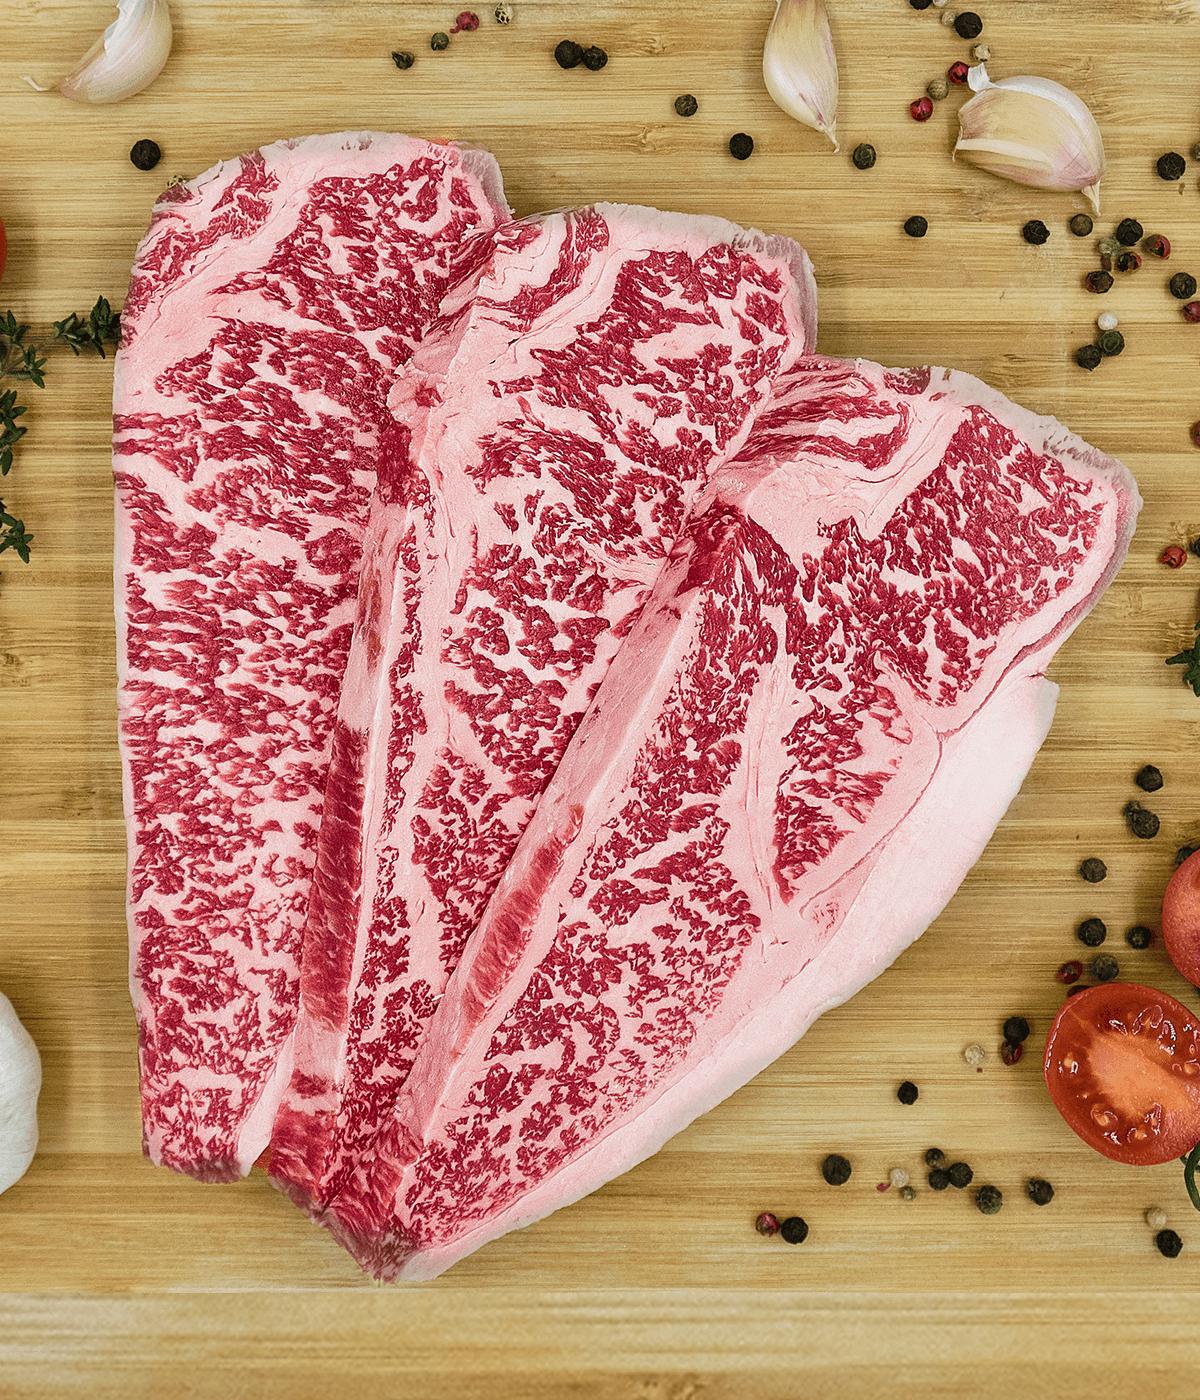 Мраморная говядина польза и вред для организма с фото: кулинарика